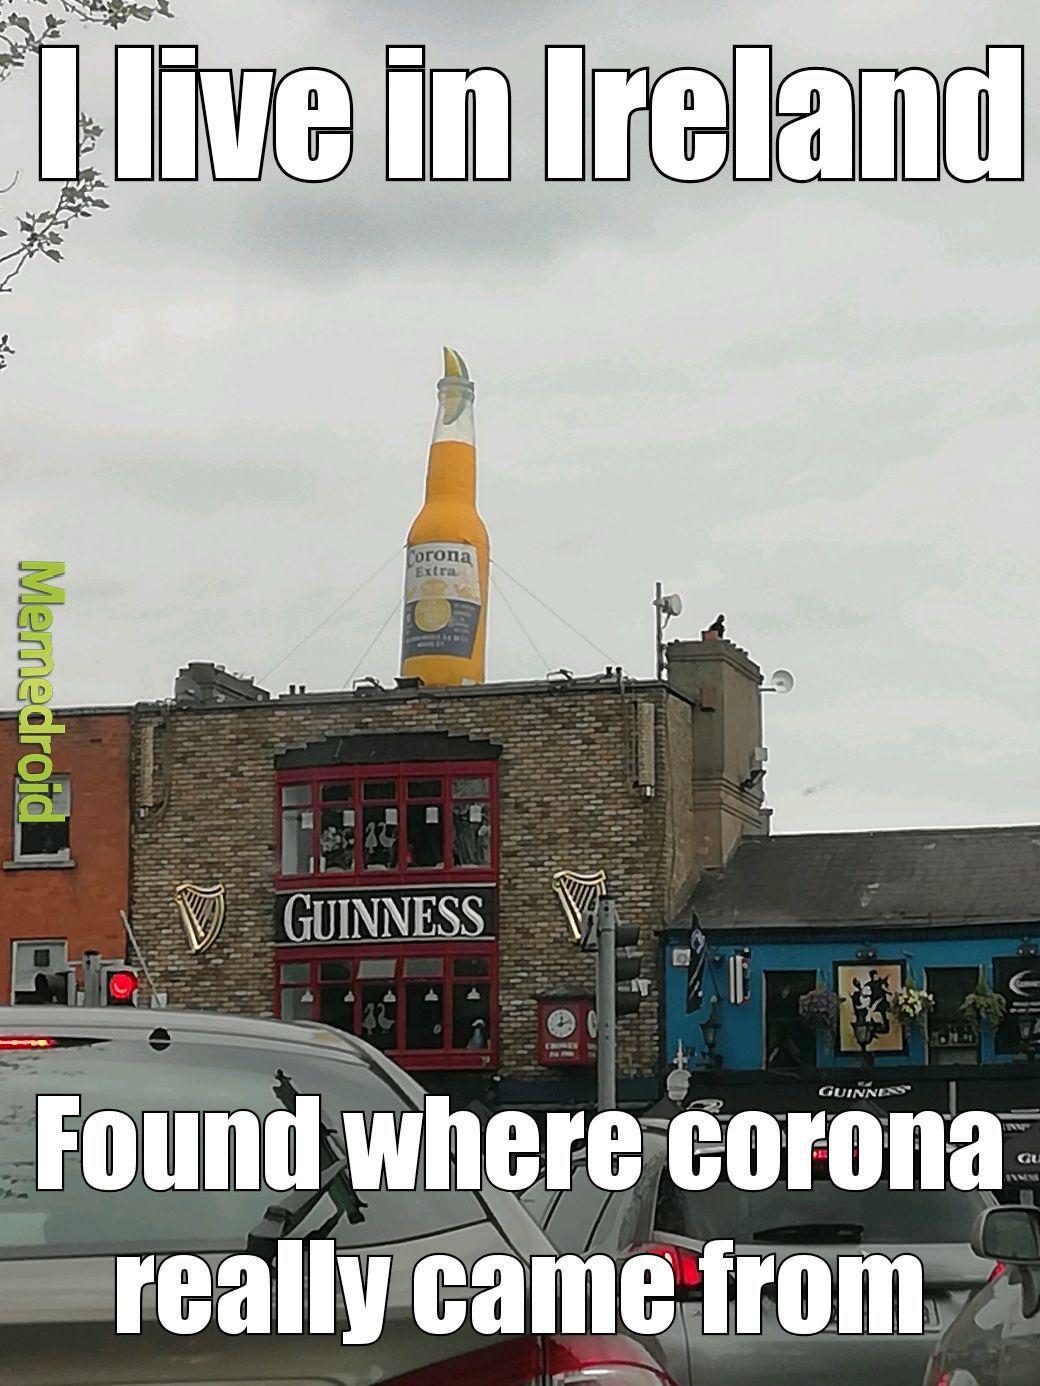 Found corona virus - meme